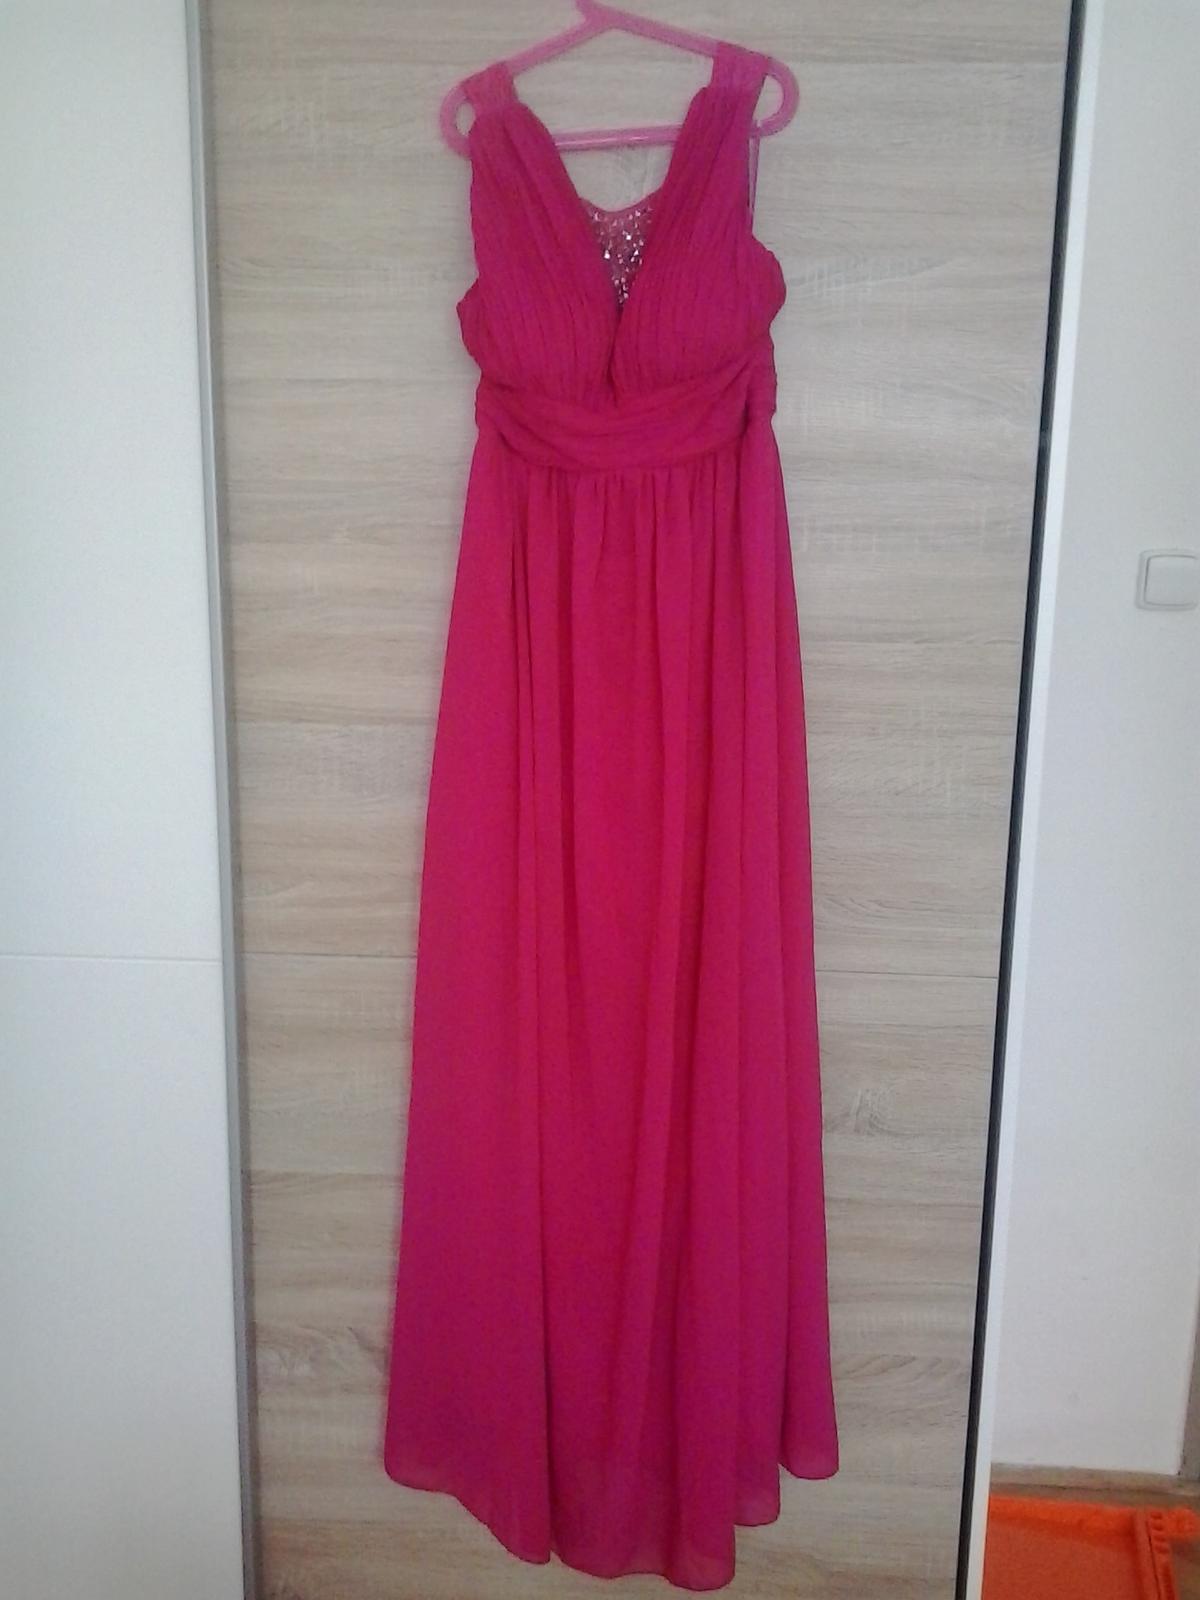 6d7760f3058 Fuchsiové dlouhé šaty